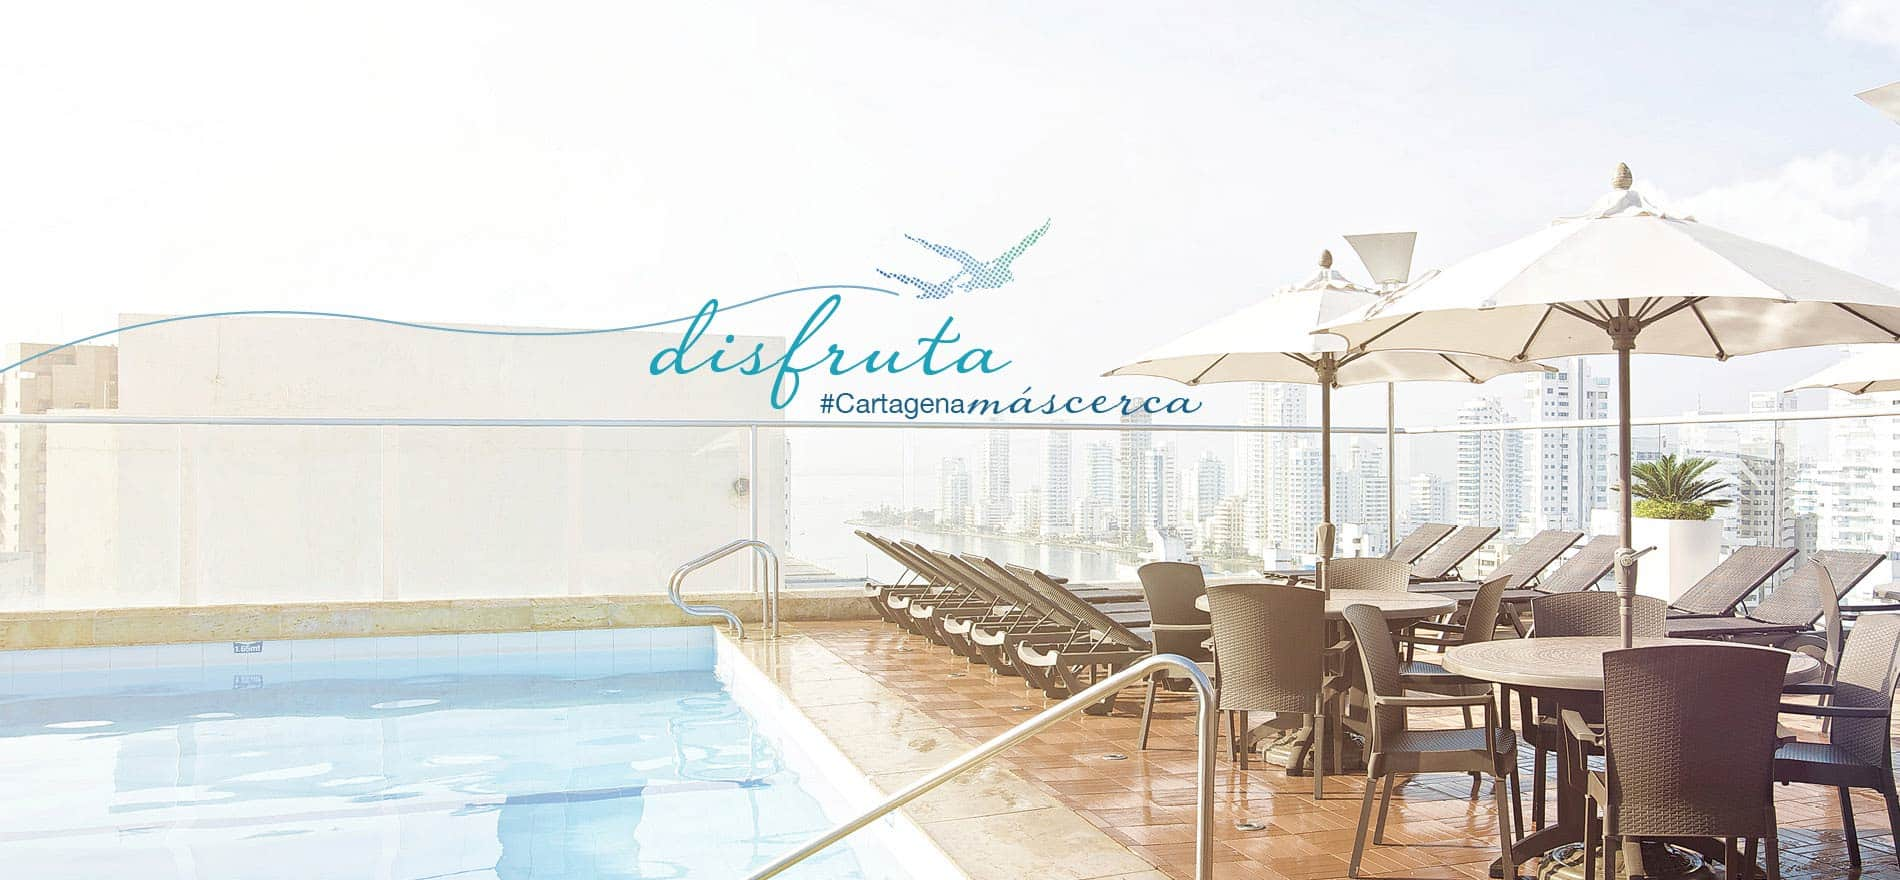 Piscina piso 21 Hotel Capilla del Mar